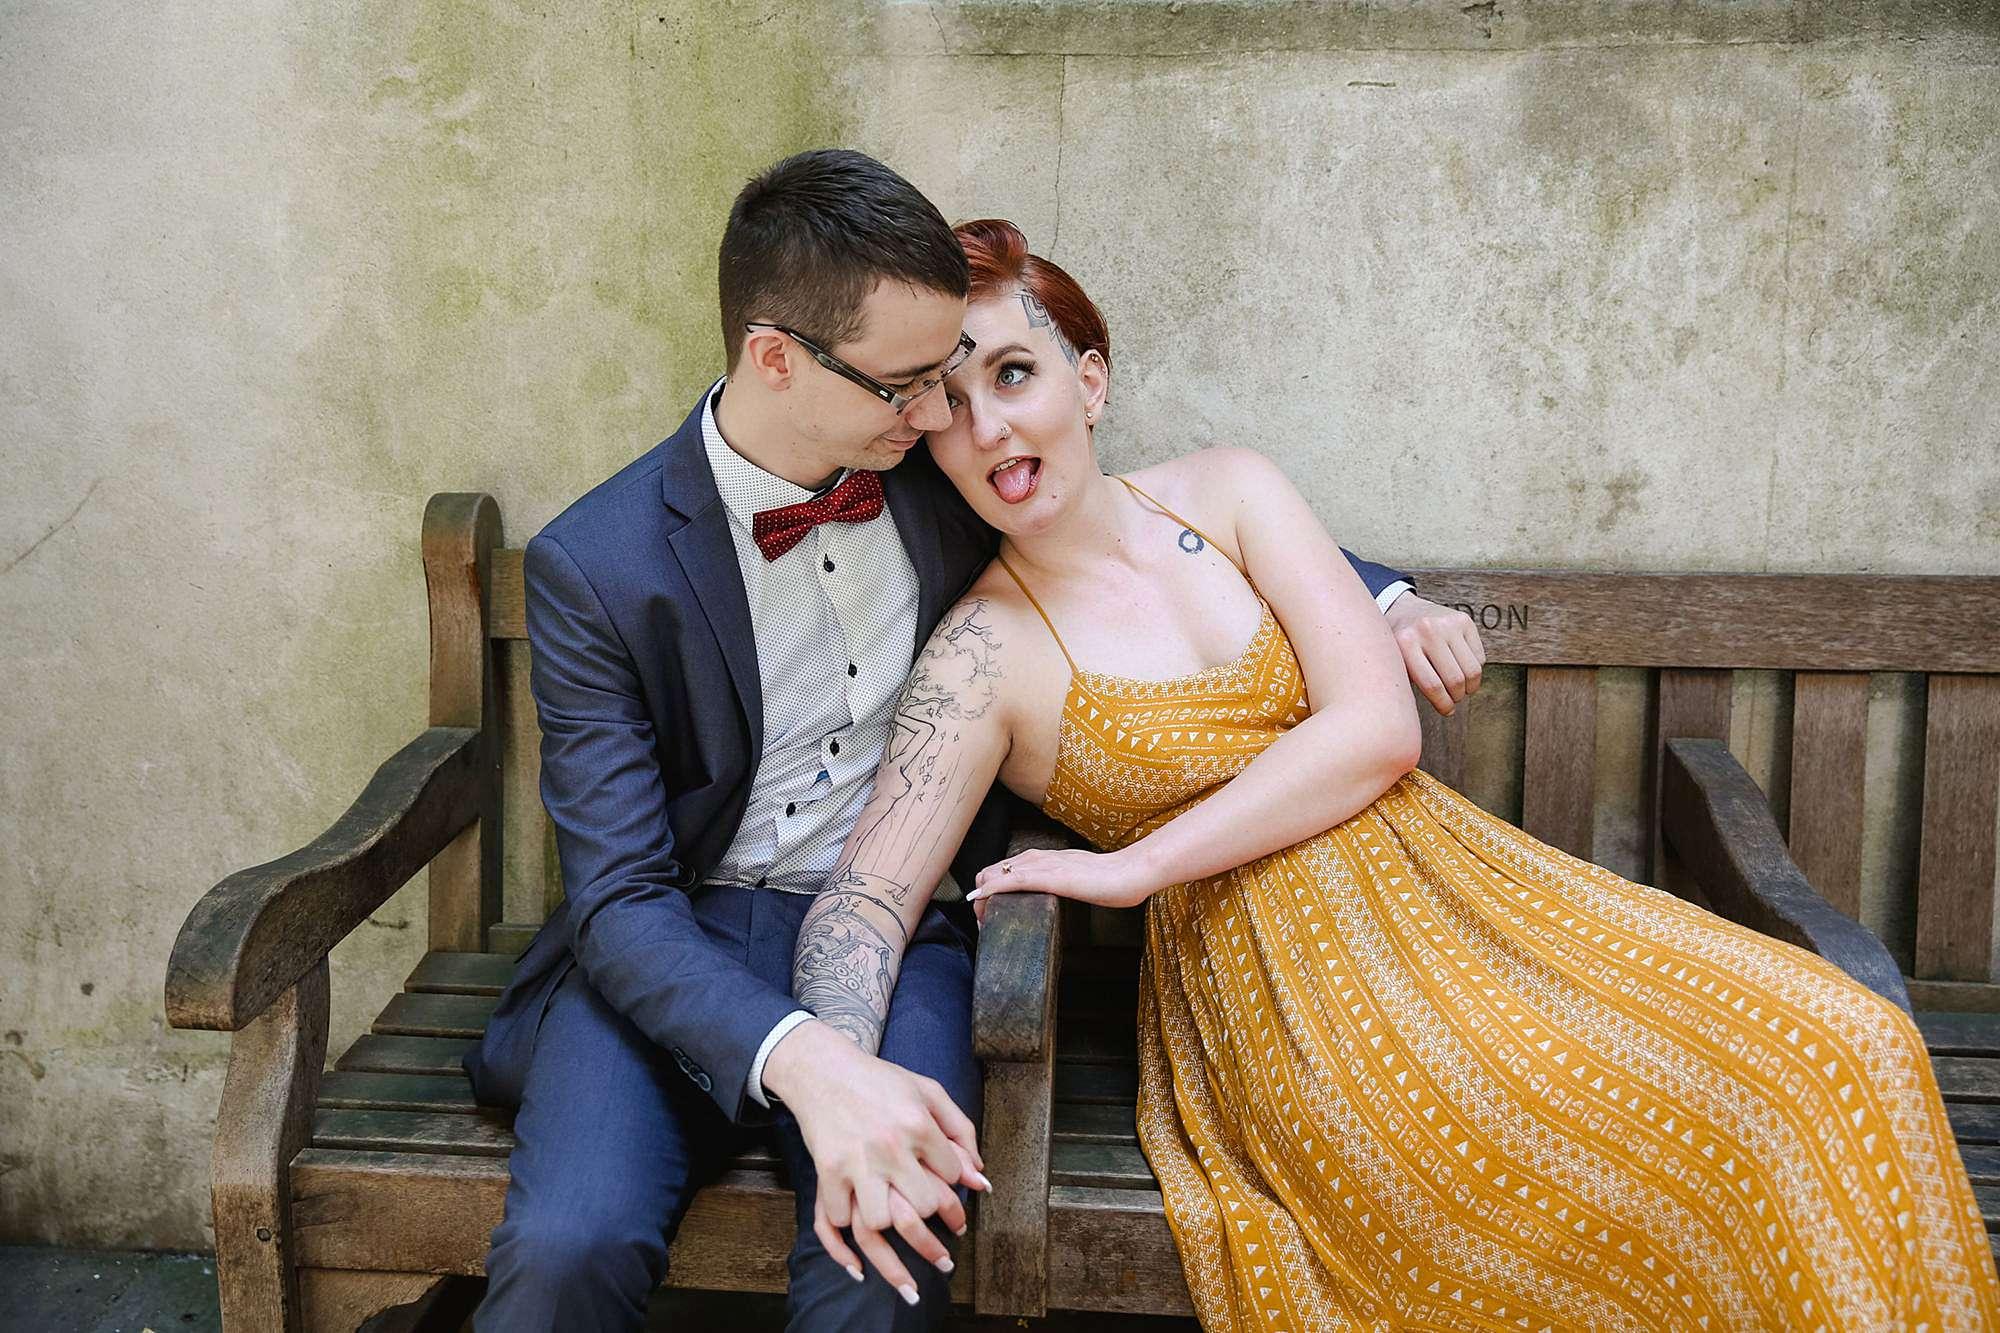 london engagement session fun portrait of couple pulling faces